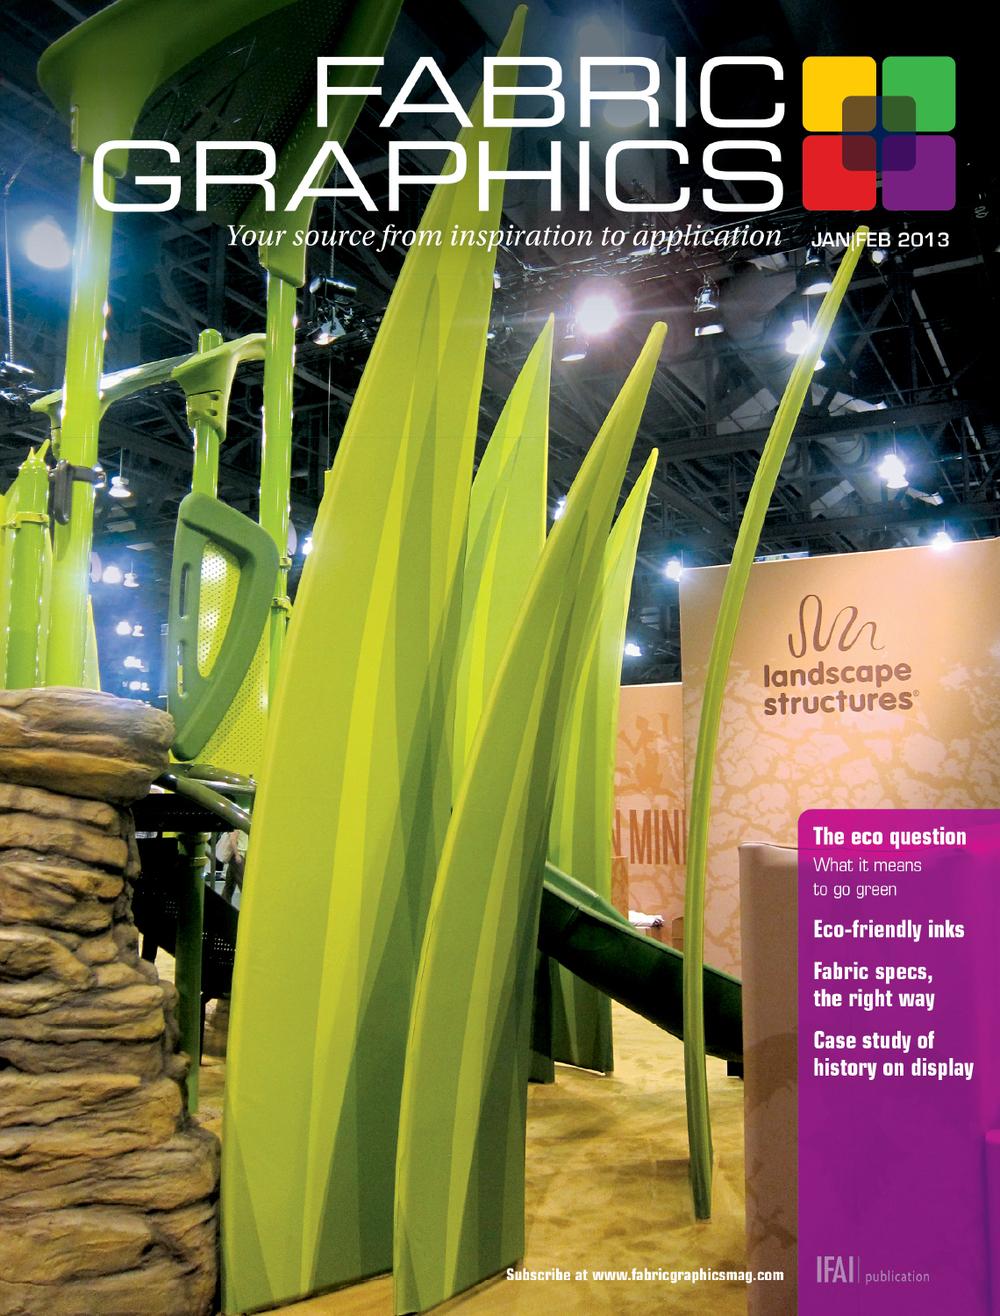 Magazine-FabricGraphics0113.jpg